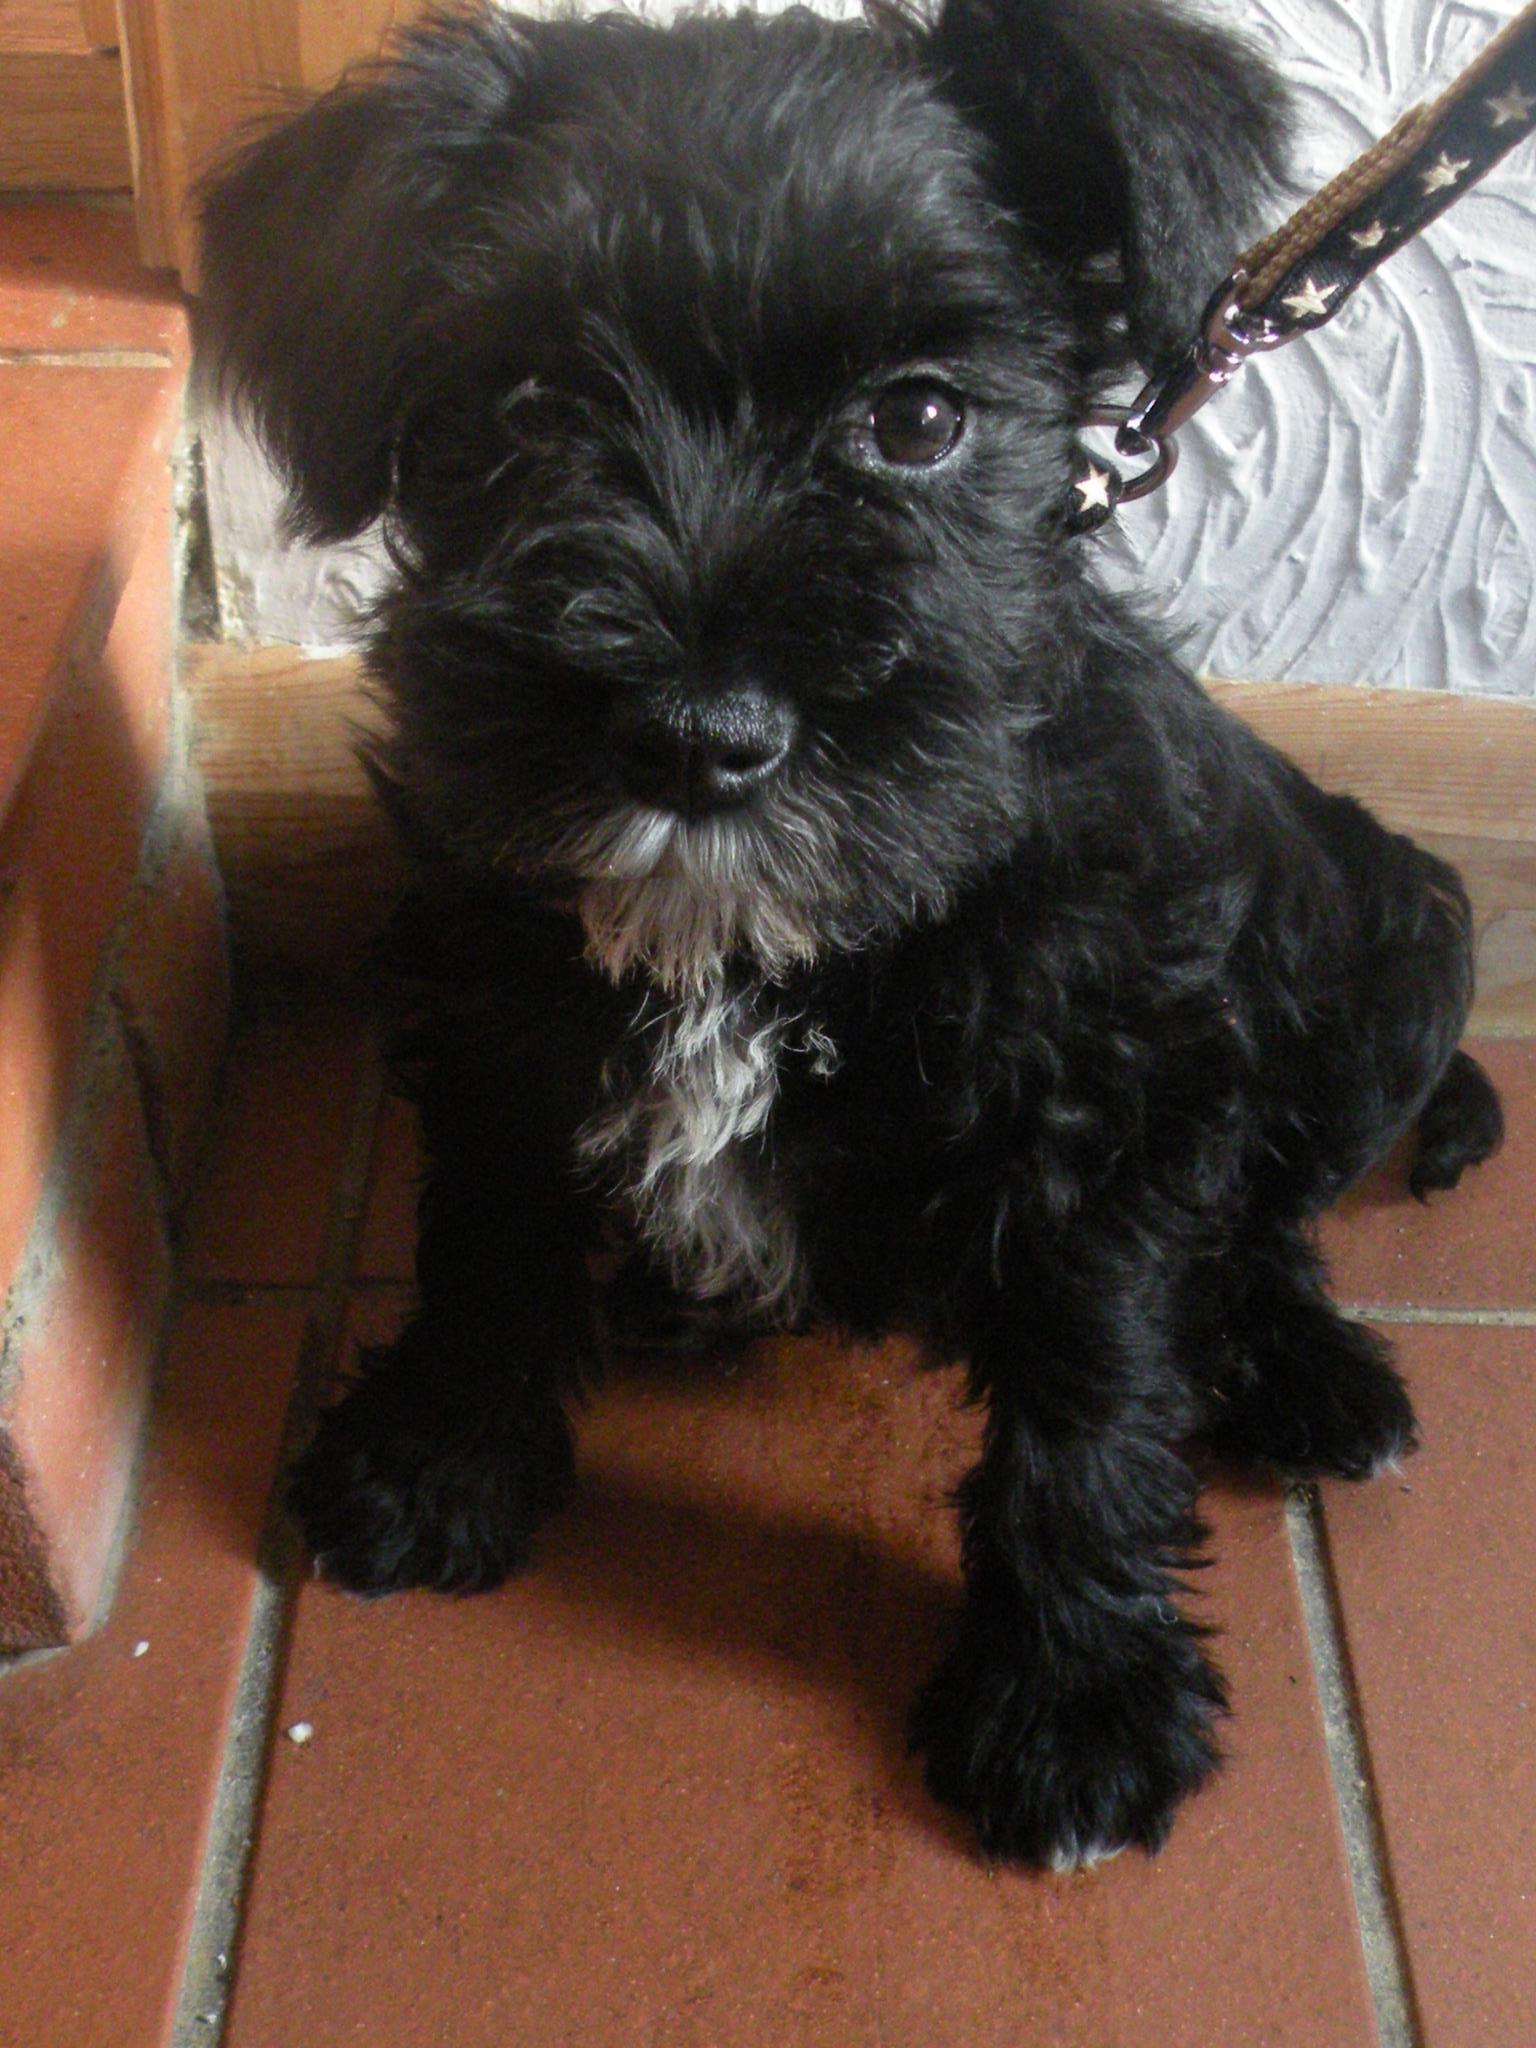 Meet Beau The 8 Week Old Miniature Schnauzer What A Cutie Jennet Mv Chichester Mini Schnauzer Puppies Schnauzer Puppy Miniature Schnauzer